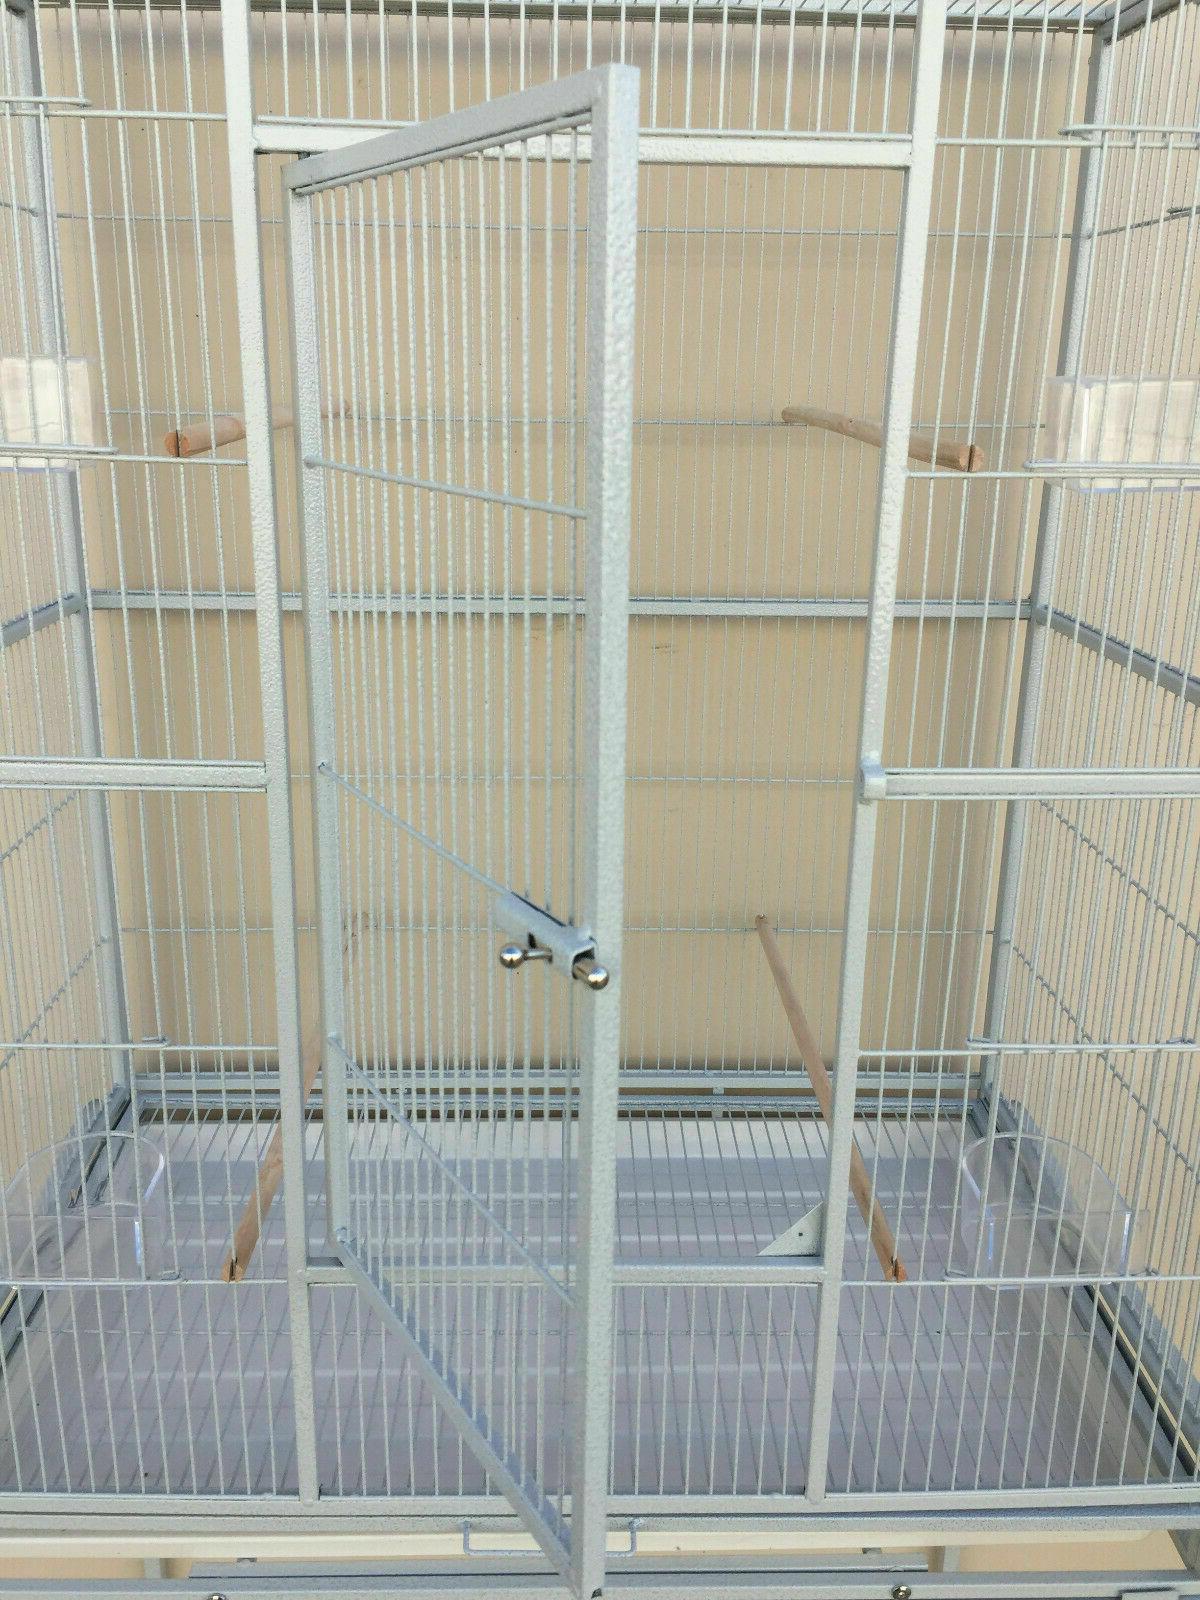 Cage Aviary Budgies